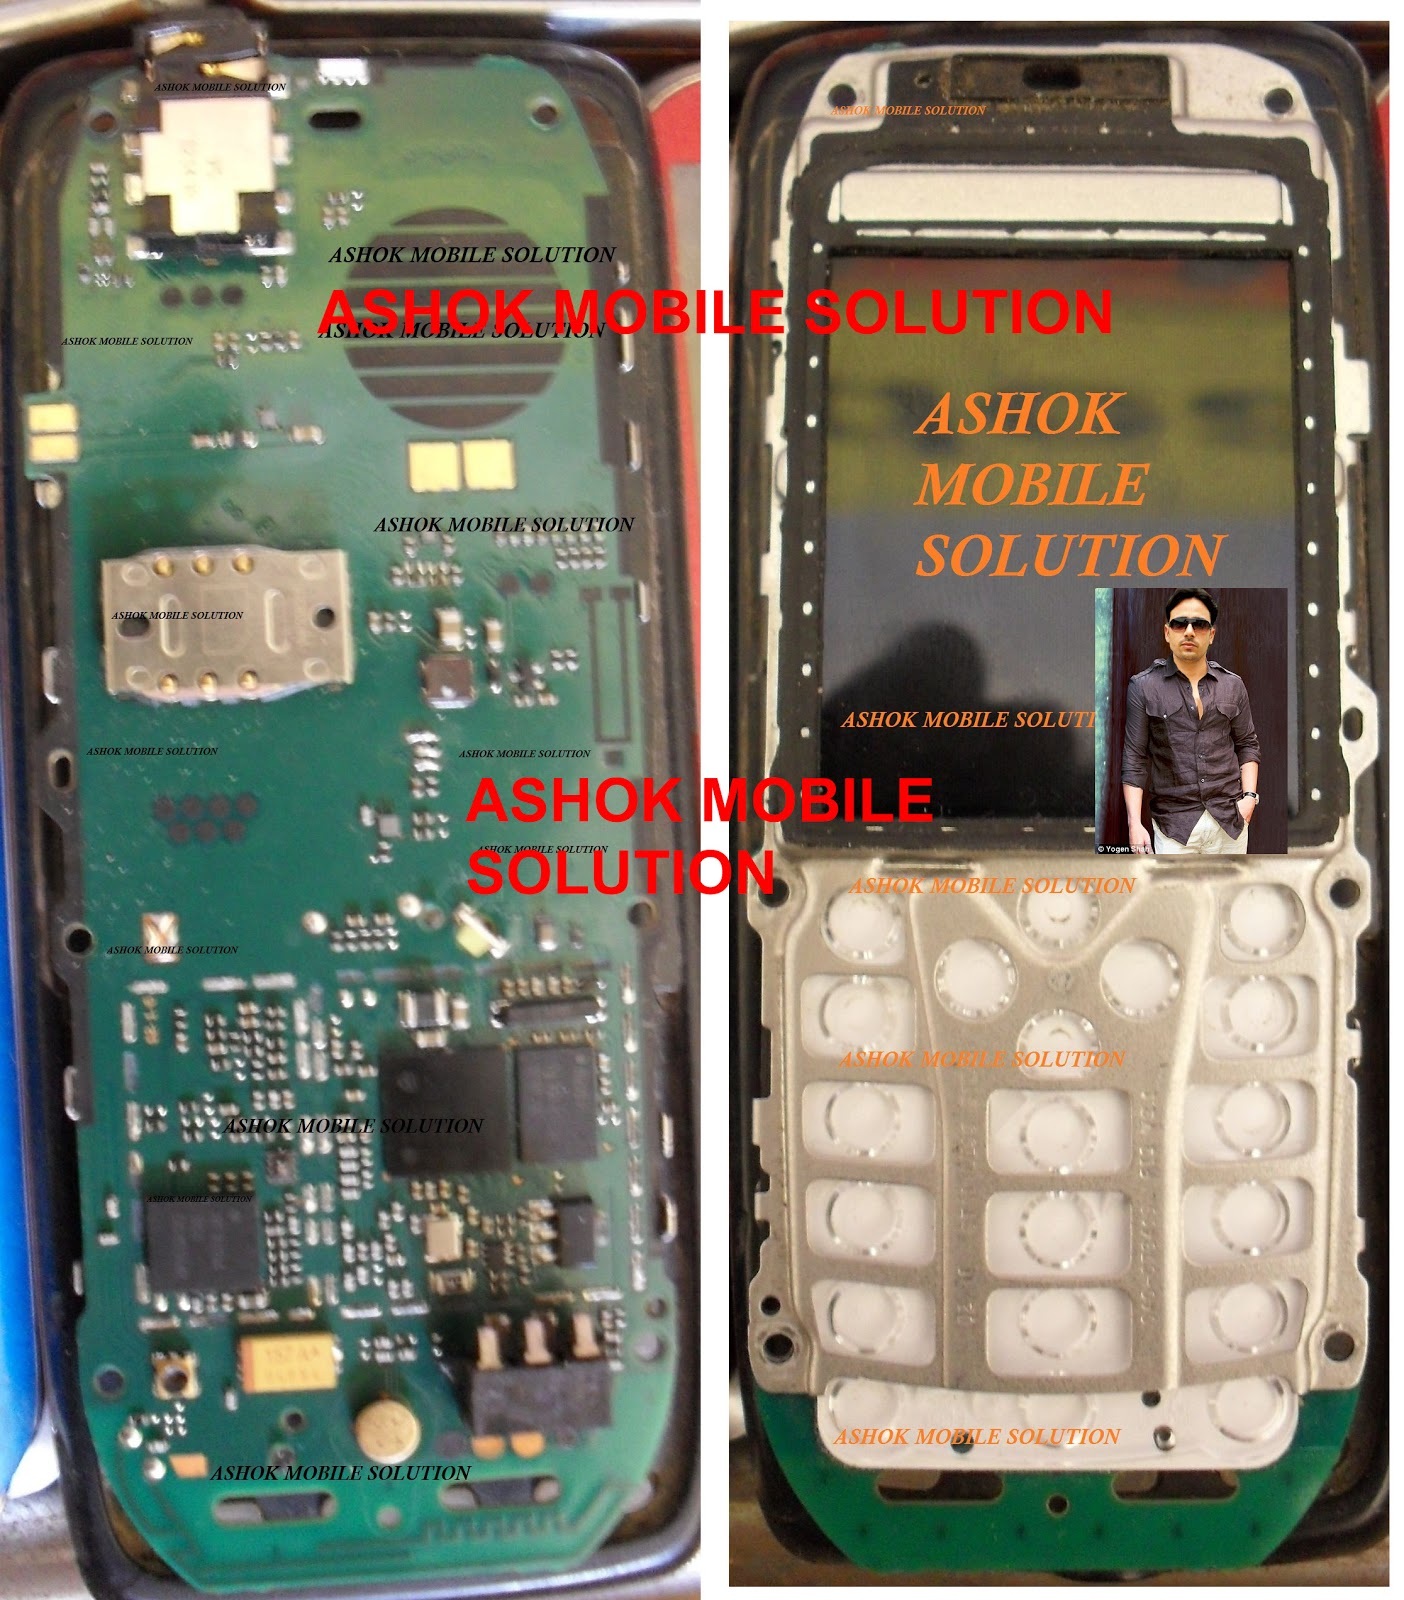 Nokia 114 Pcb Circuit Diagram X Ashok Mobile Solution 16162 Full Board